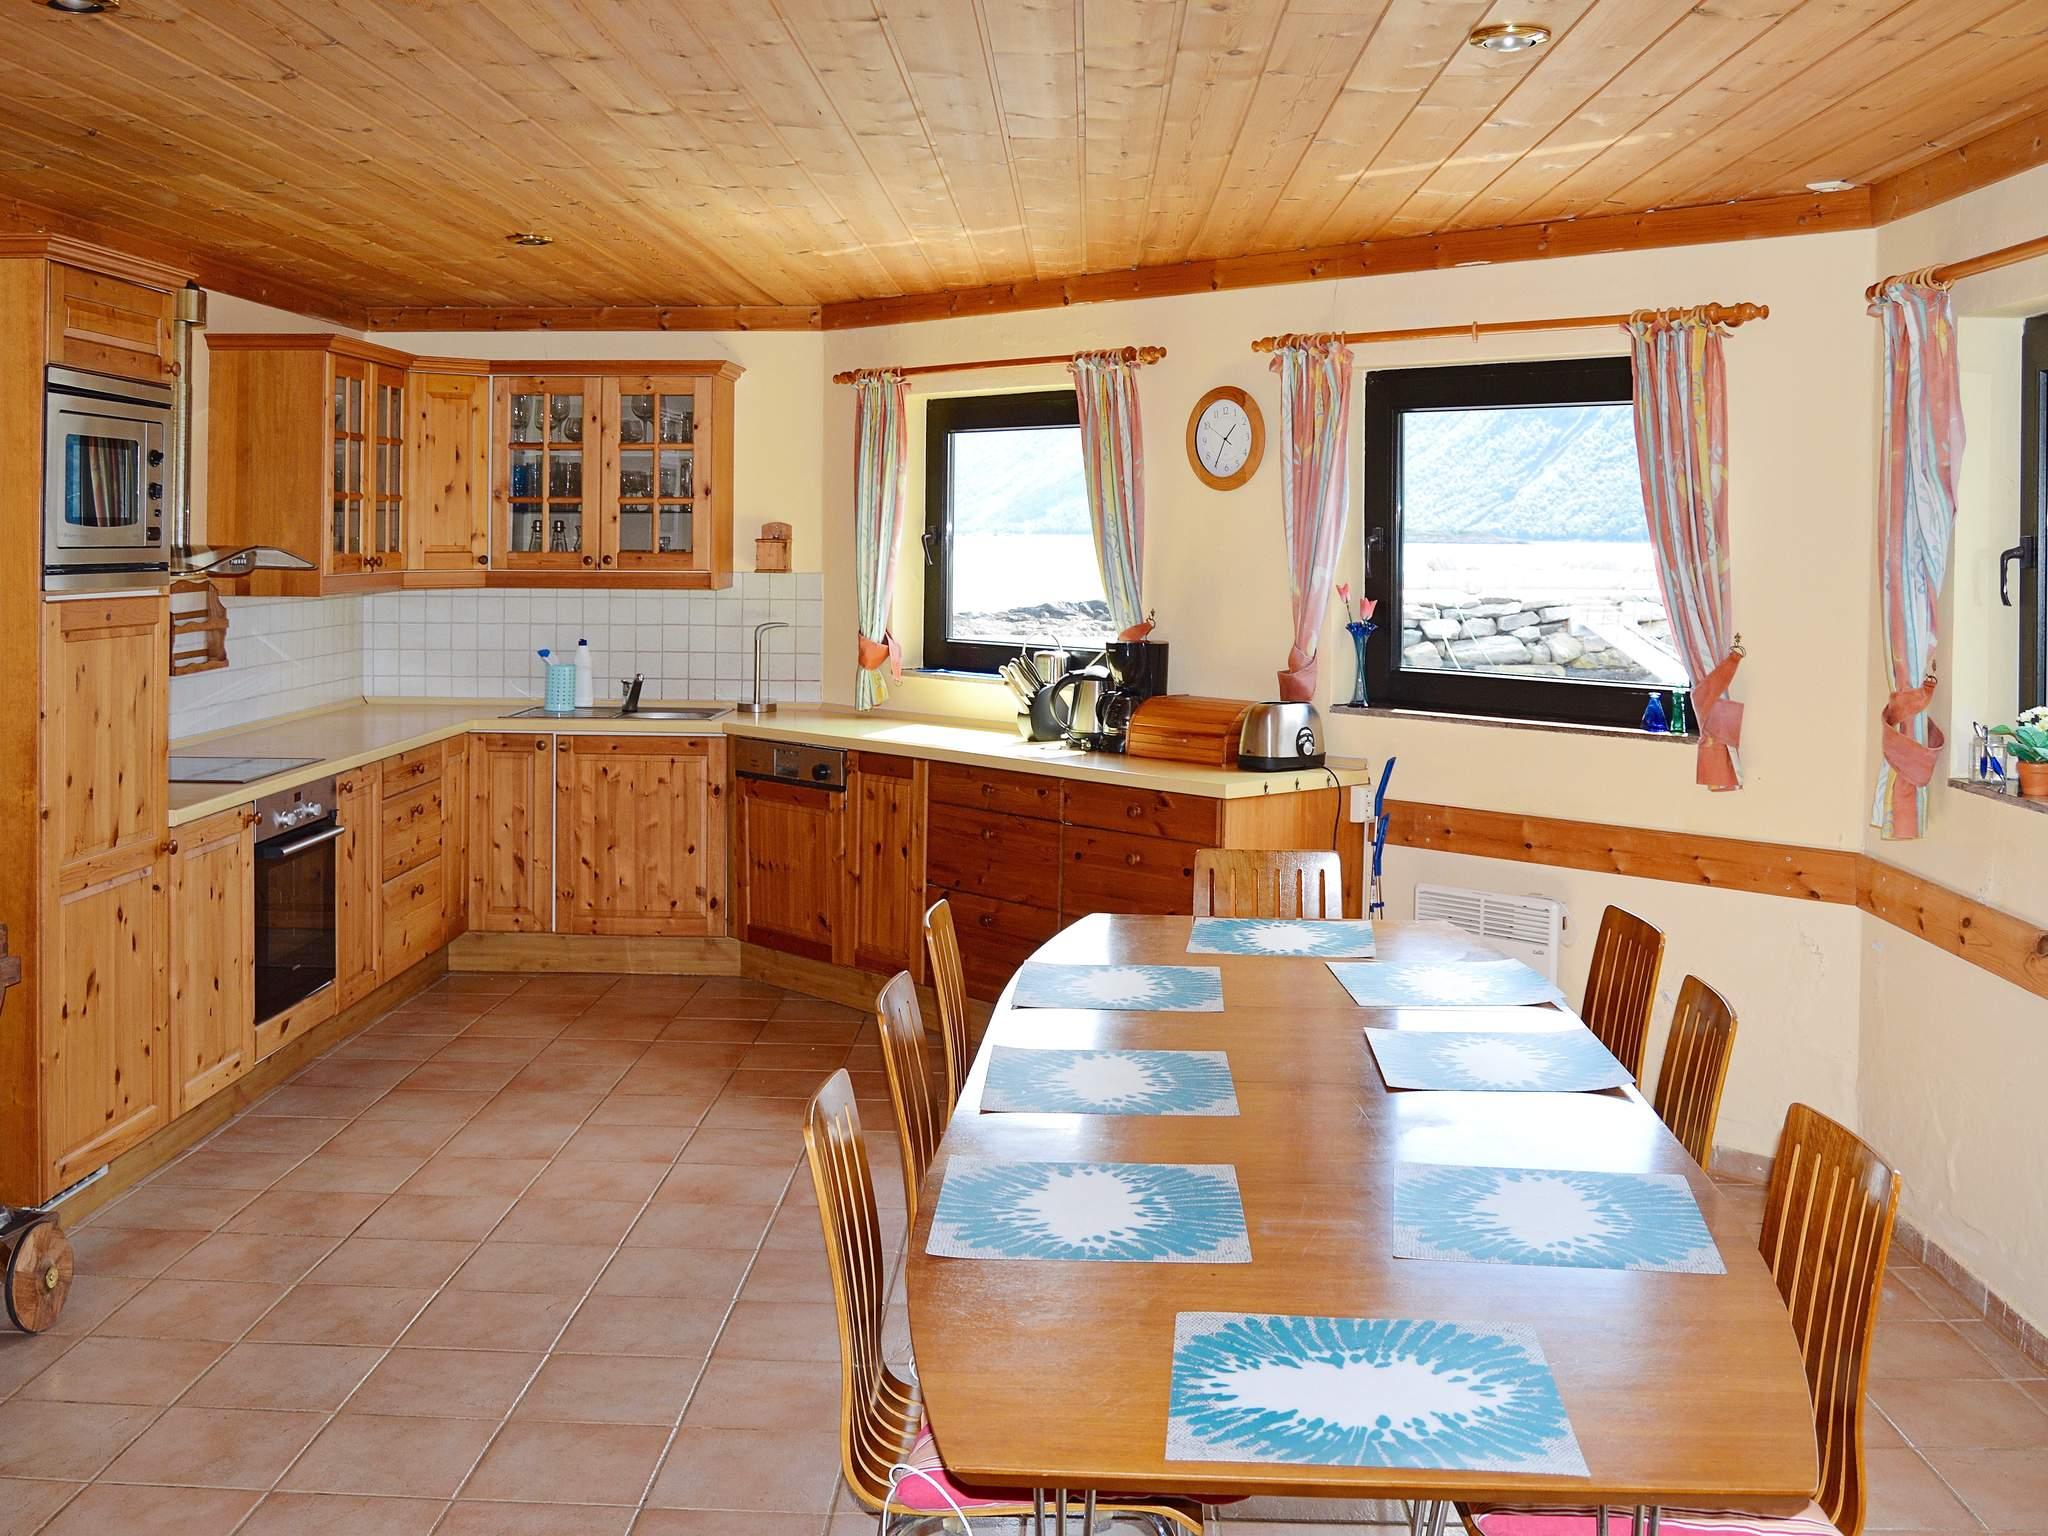 Ferienhaus Eidsvåg (84695), Eidsvåg, More - Romsdal, Westnorwegen, Norwegen, Bild 9